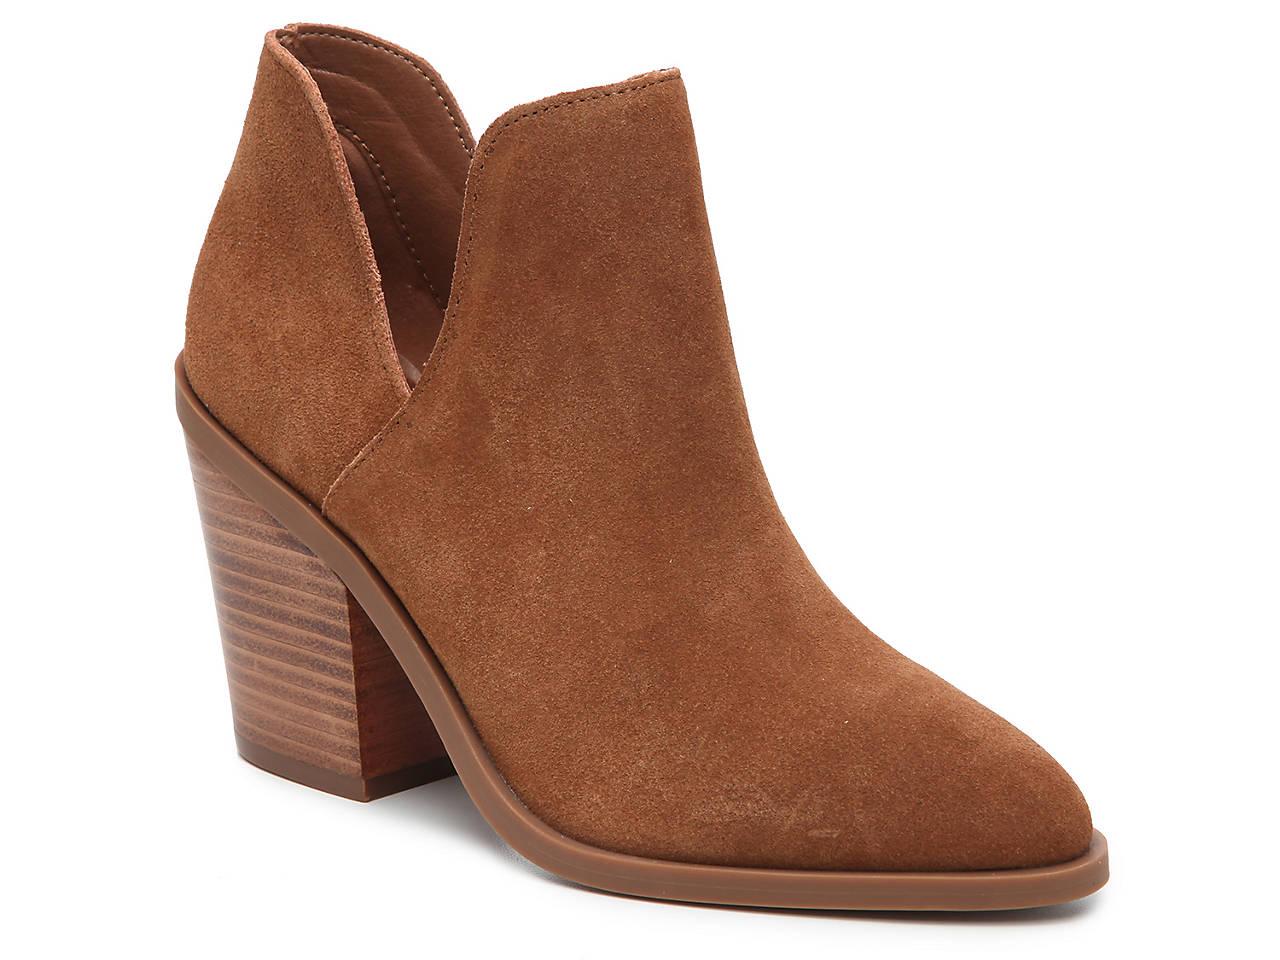 3146fa04c4d Steve Madden Aker Bootie Women s Shoes